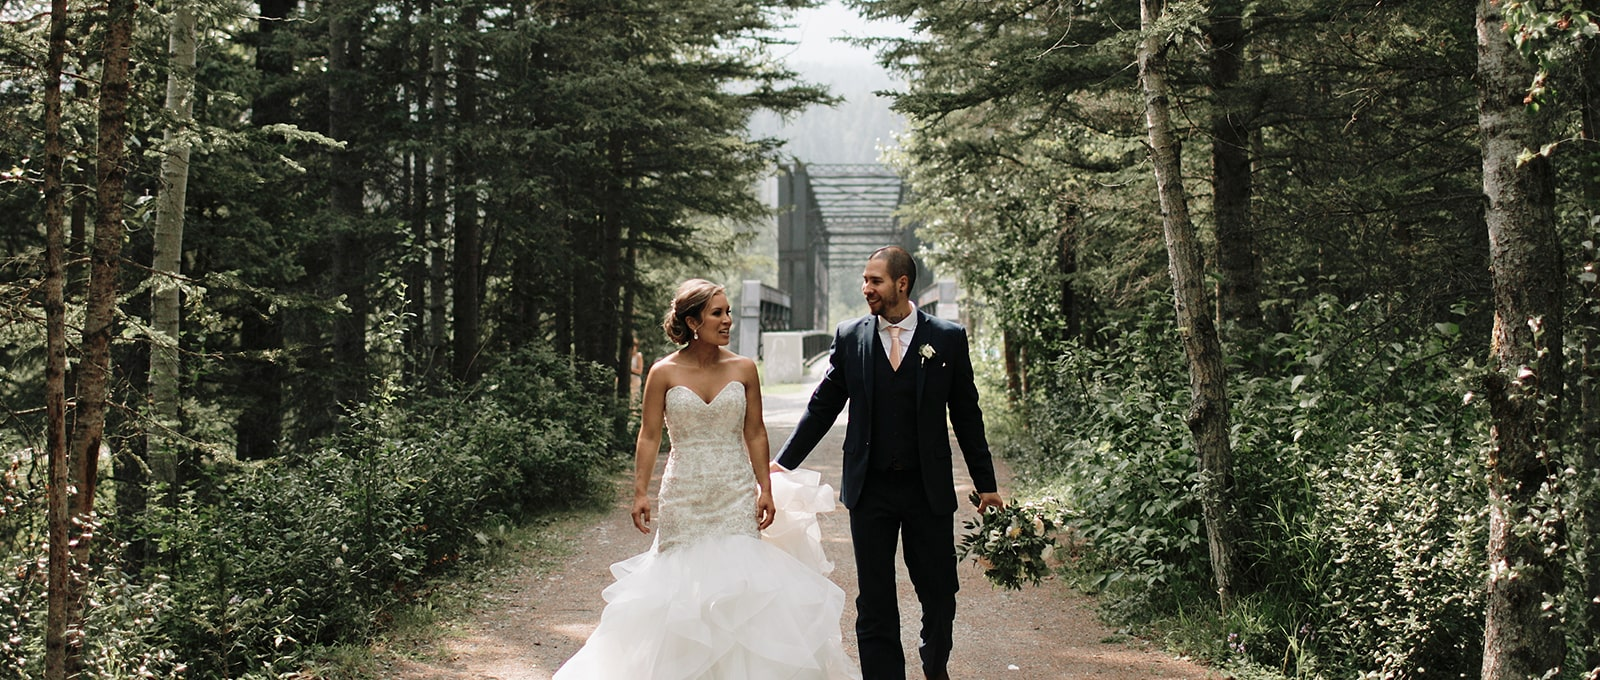 corie-jamie-calgary-wedding-videography